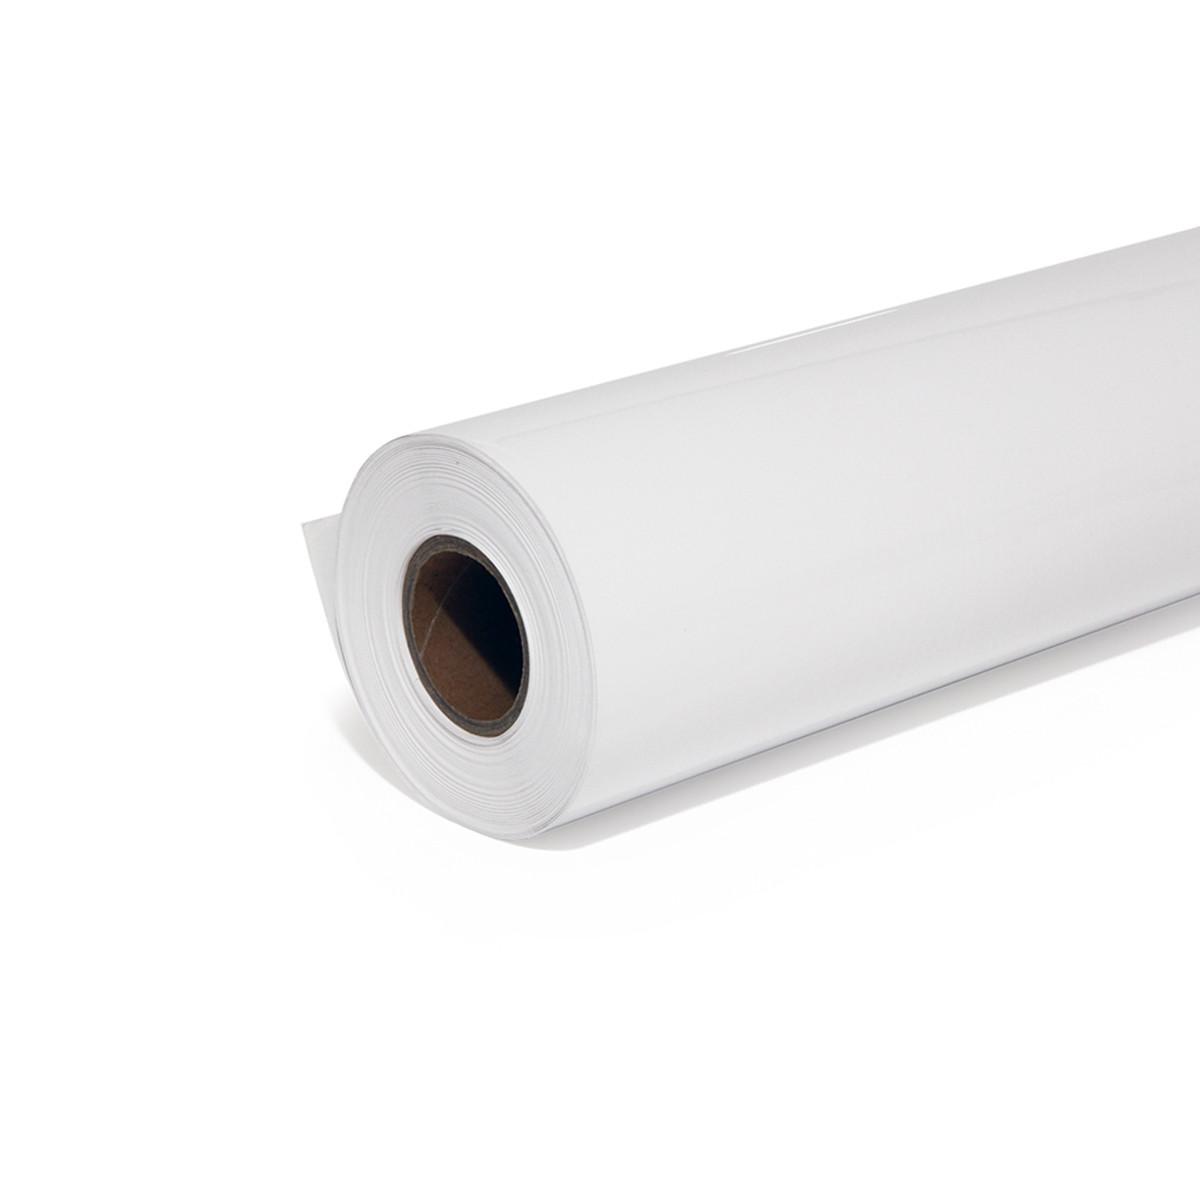 Papel para Plotter Sulfite | 90g Rolo 610MM x 50M